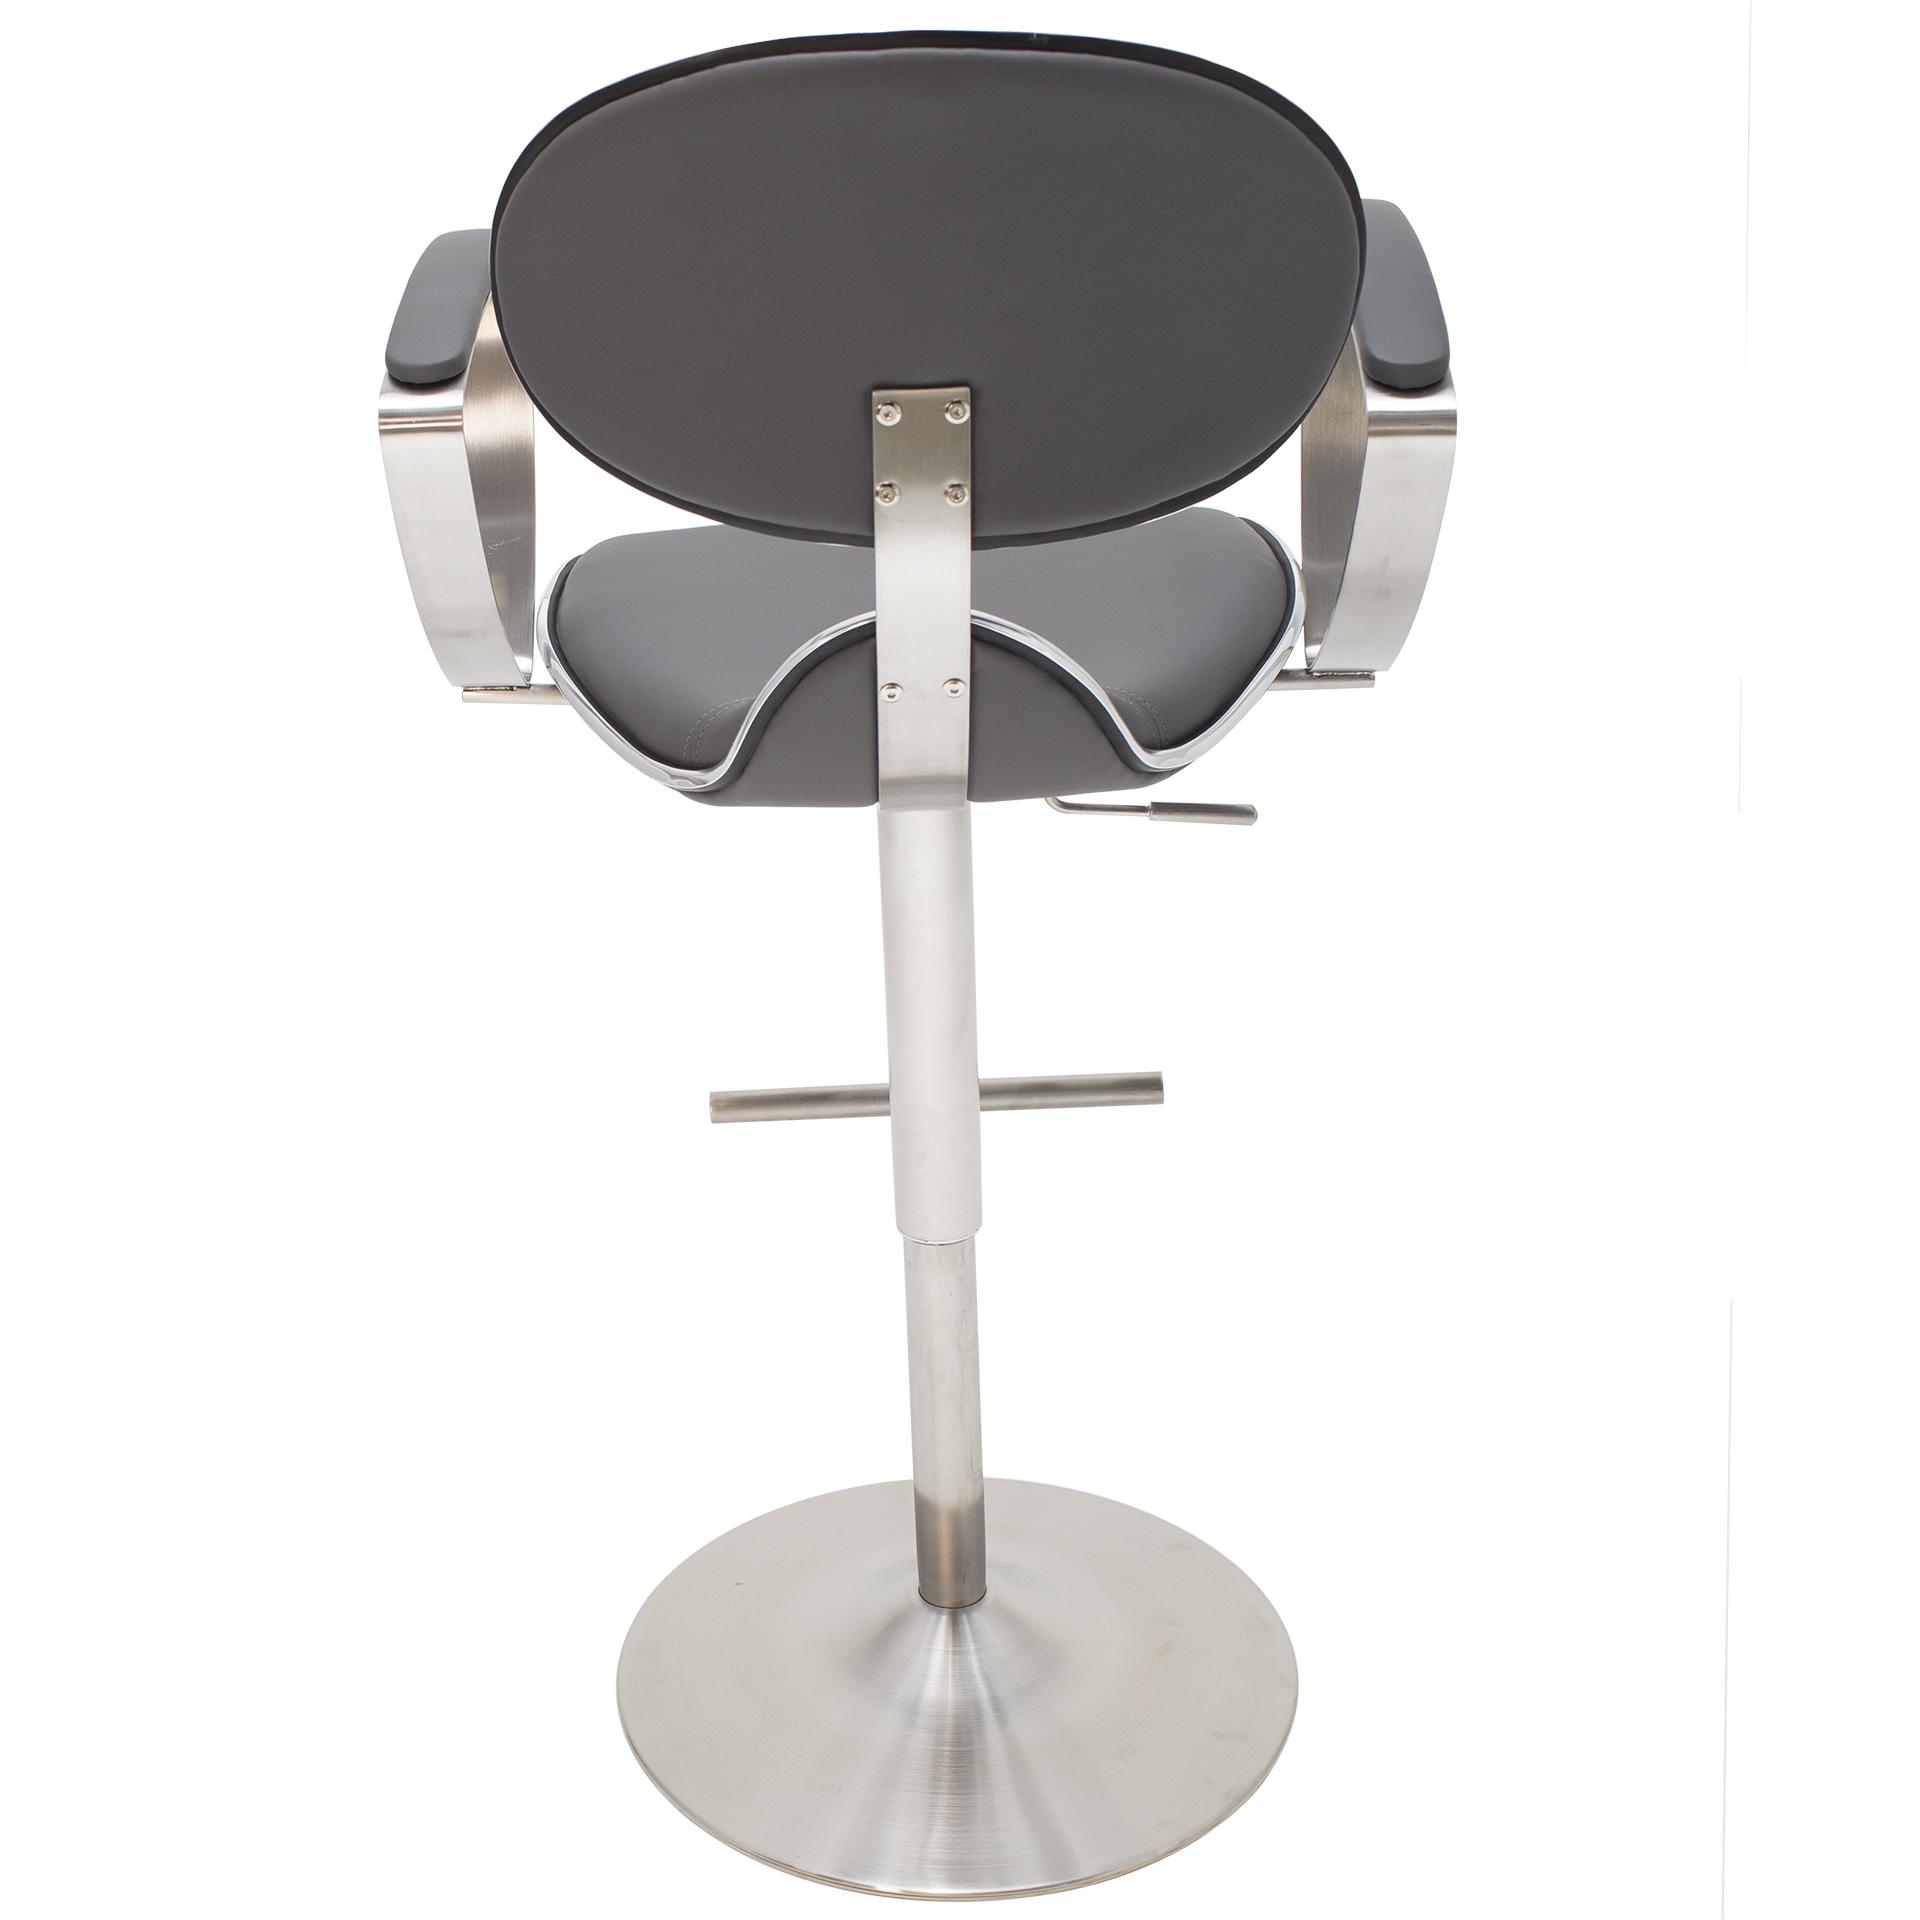 Jaylo Brushed Stainless Steel Adjustable Height Swivel